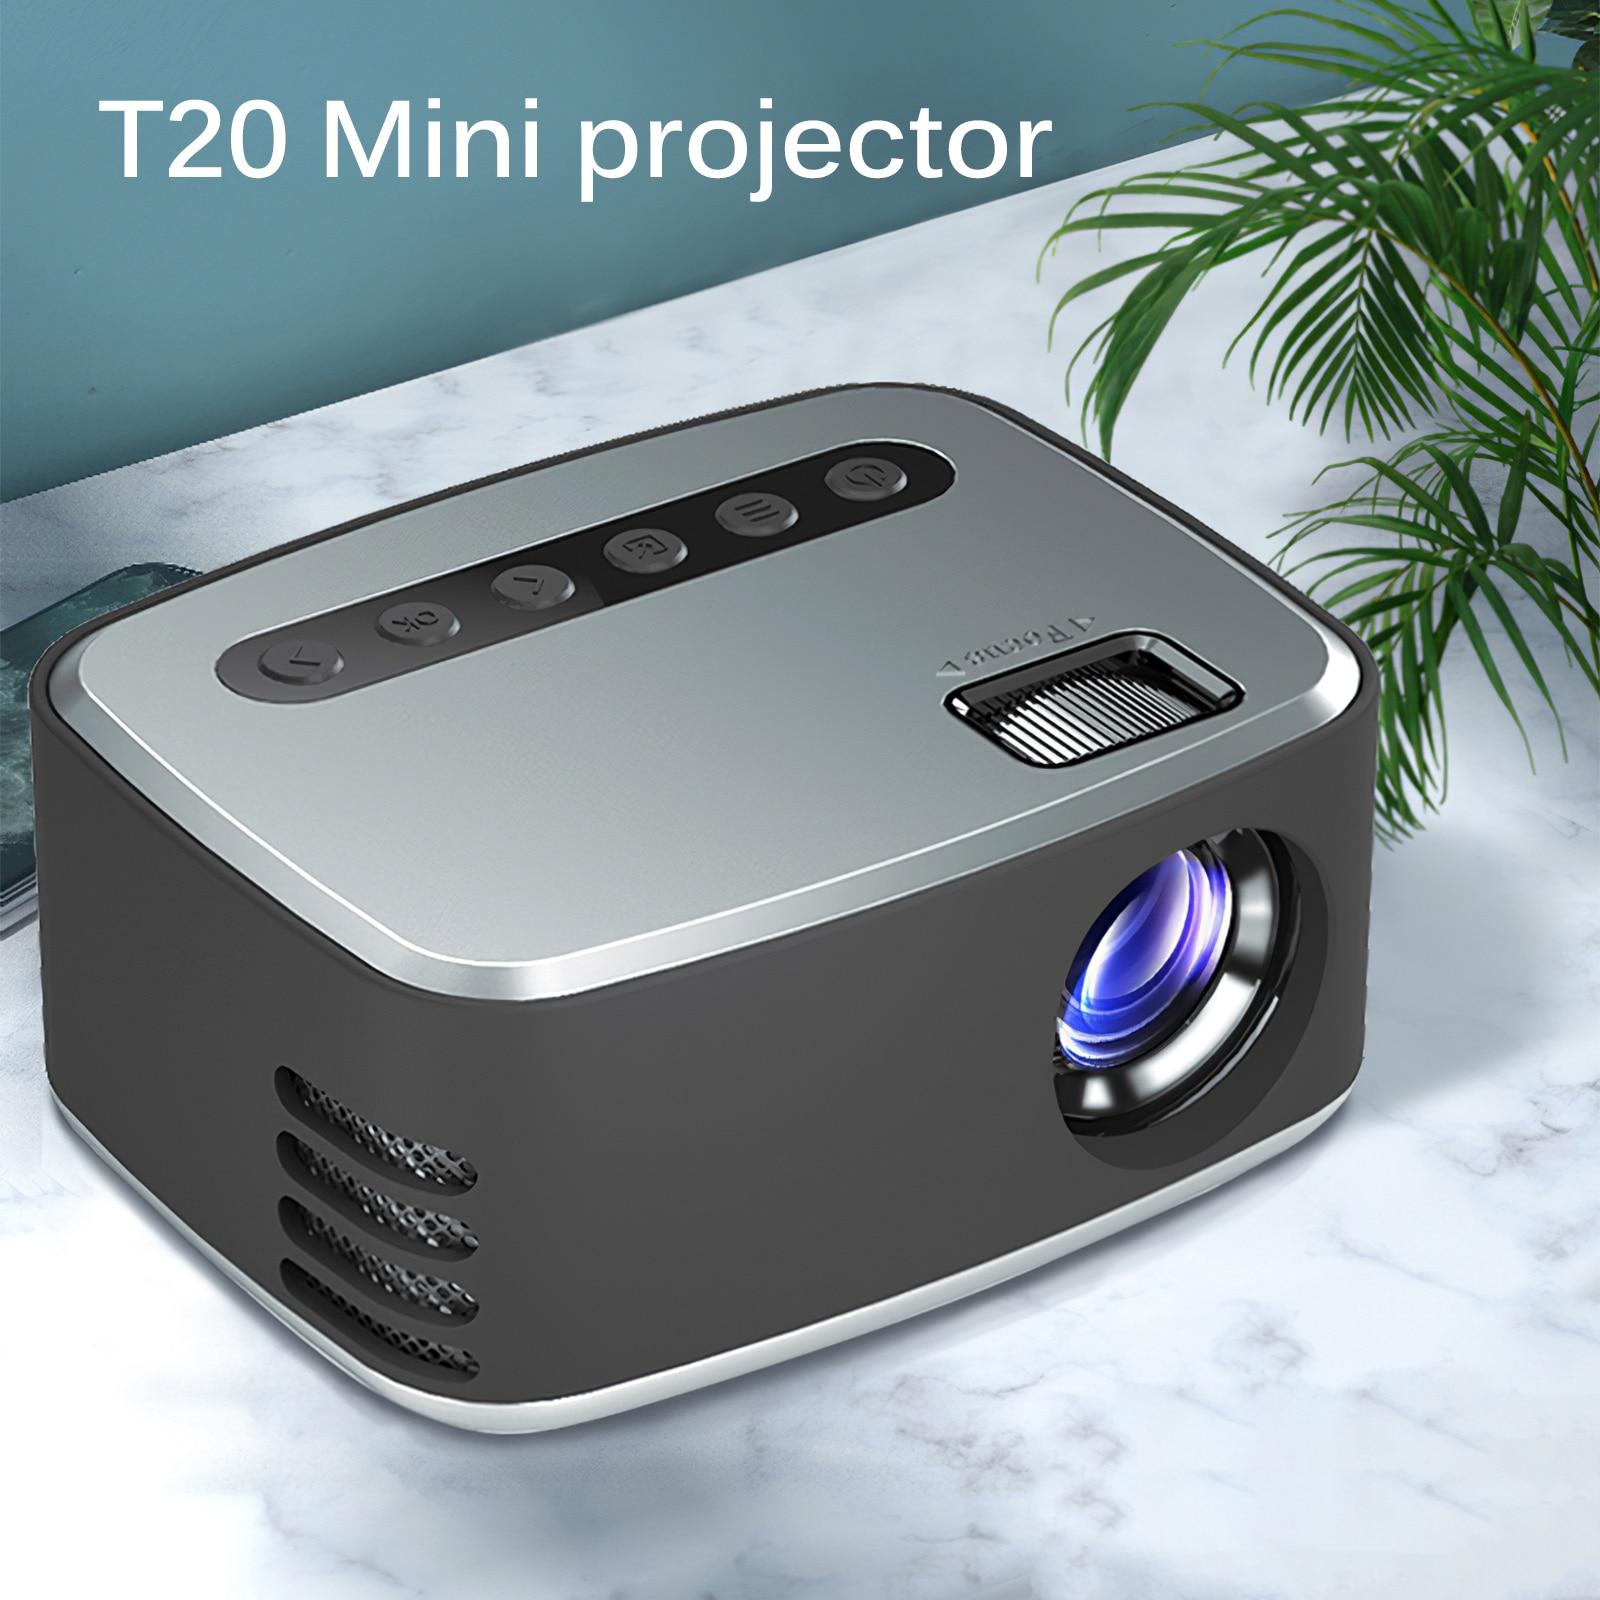 HD جهاز عرض صغير الأصلية 1080x1920P LED ل الروبوت WiFi البروجيكتور فيديو هوم سينما 3D HDMI-متوافق فيلم لعبة Proyector